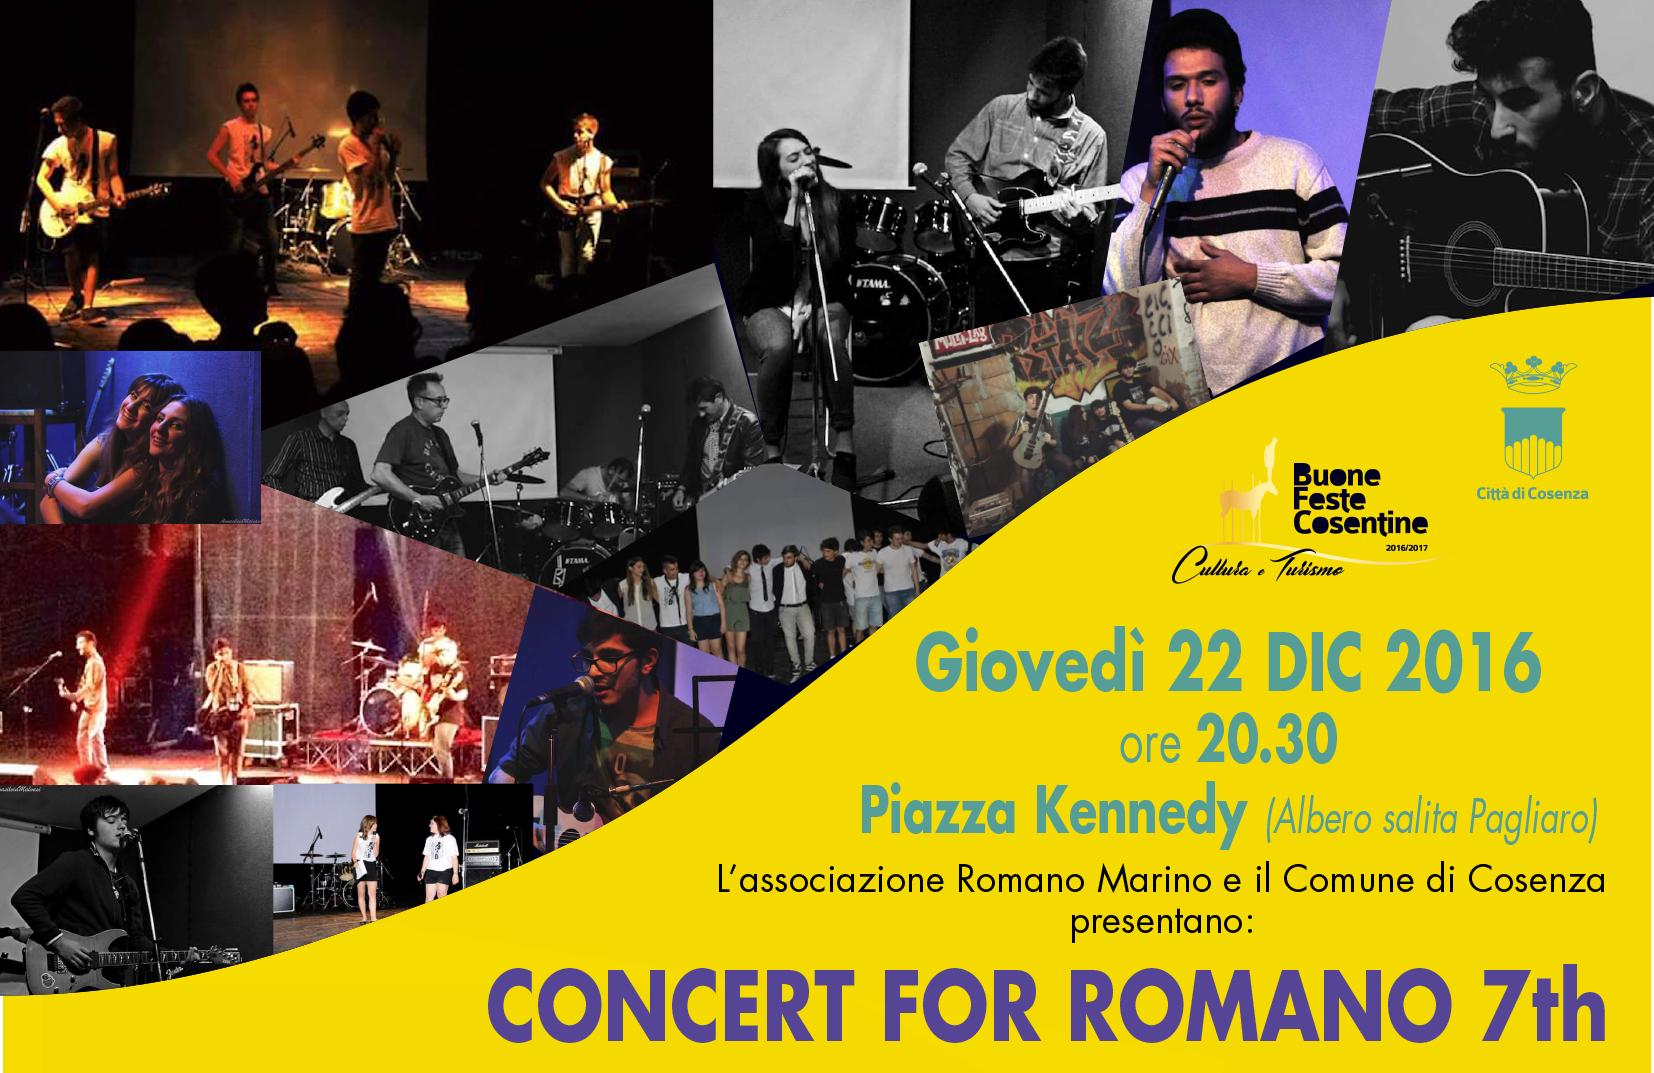 concert for romano